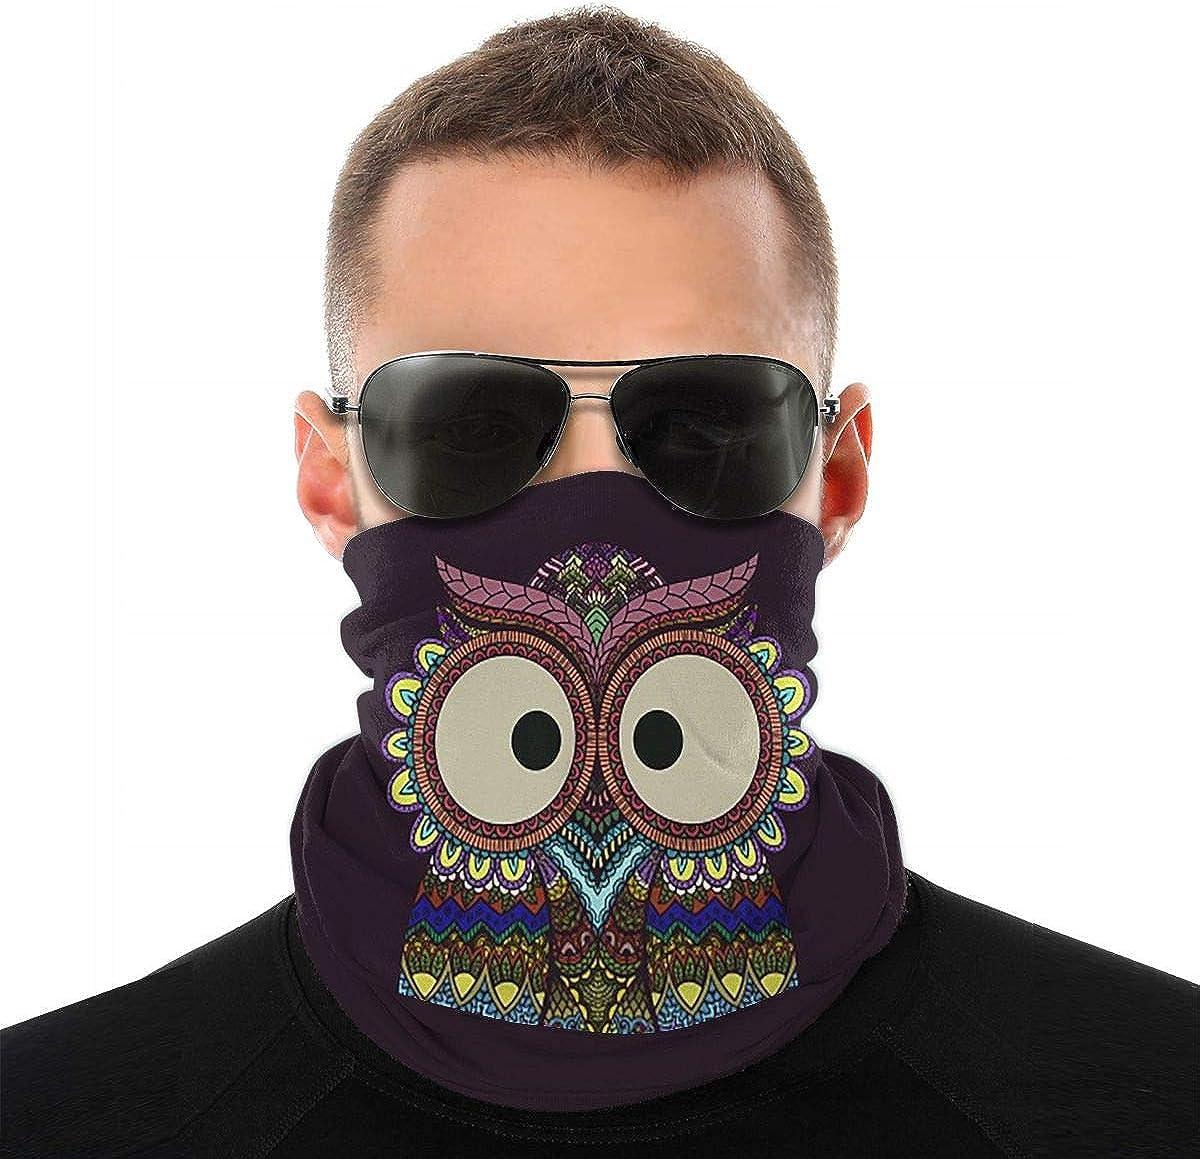 KiuLoam Tribal Ethnic Paisley Owl Bird Seamless Face Mask Bandanas Neck Gaiter for Men and Women, Multifunction Headband Scarf for Dust, Outdoors, Sports